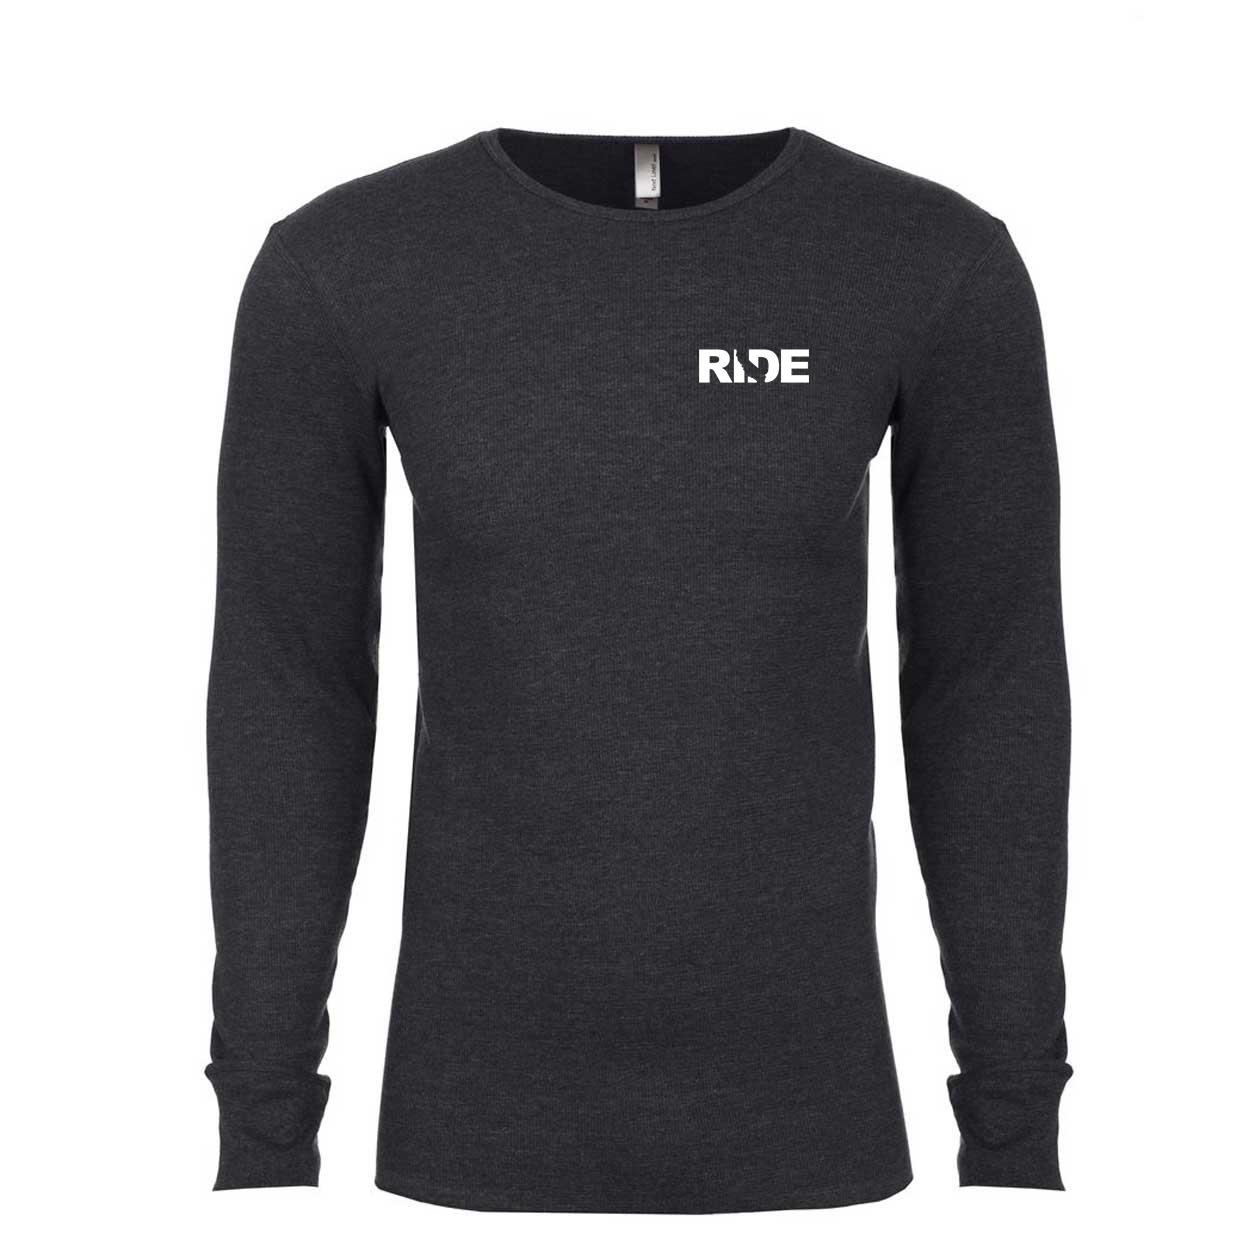 Ride California Long Sleeve Thermal Shirt Heather Charcoal (White Logo)